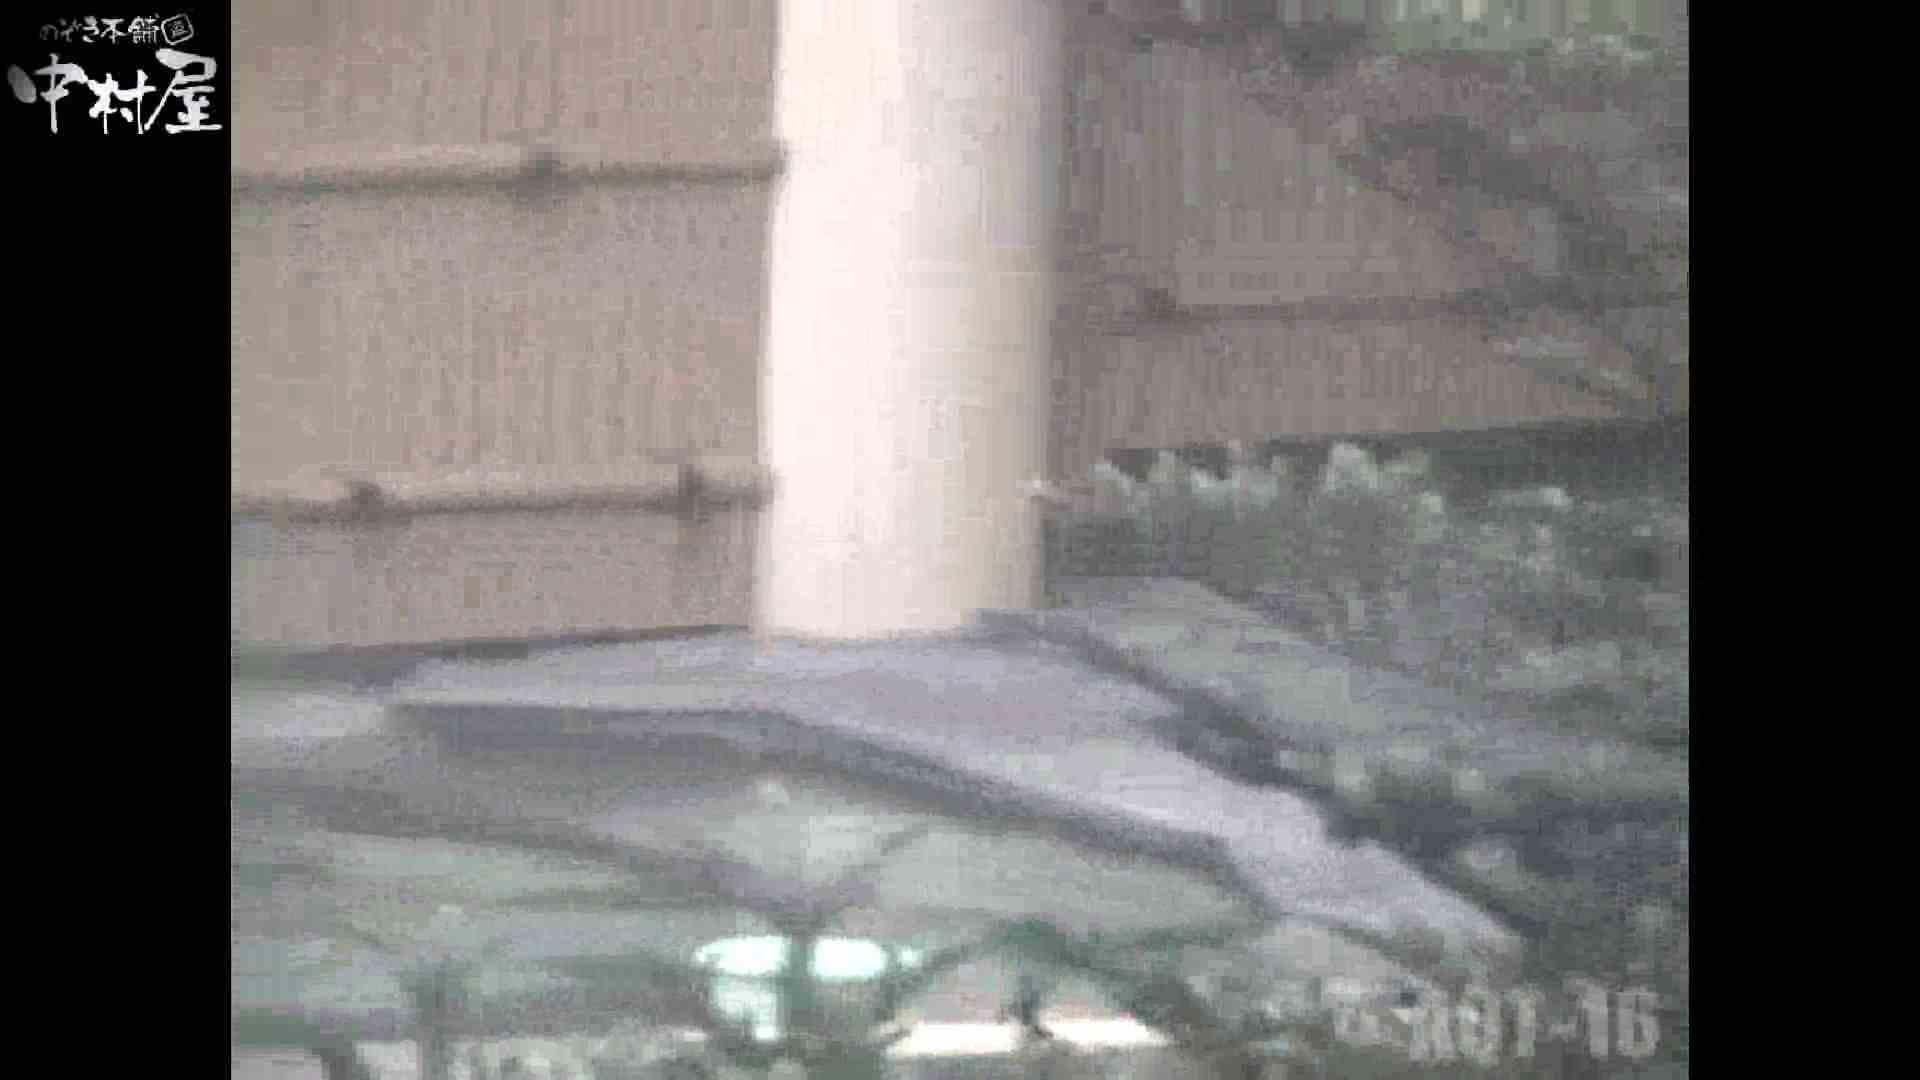 Aquaな露天風呂Vol.880潜入盗撮露天風呂十六判湯 其の八 潜入シリーズ | 盗撮  84pic 27